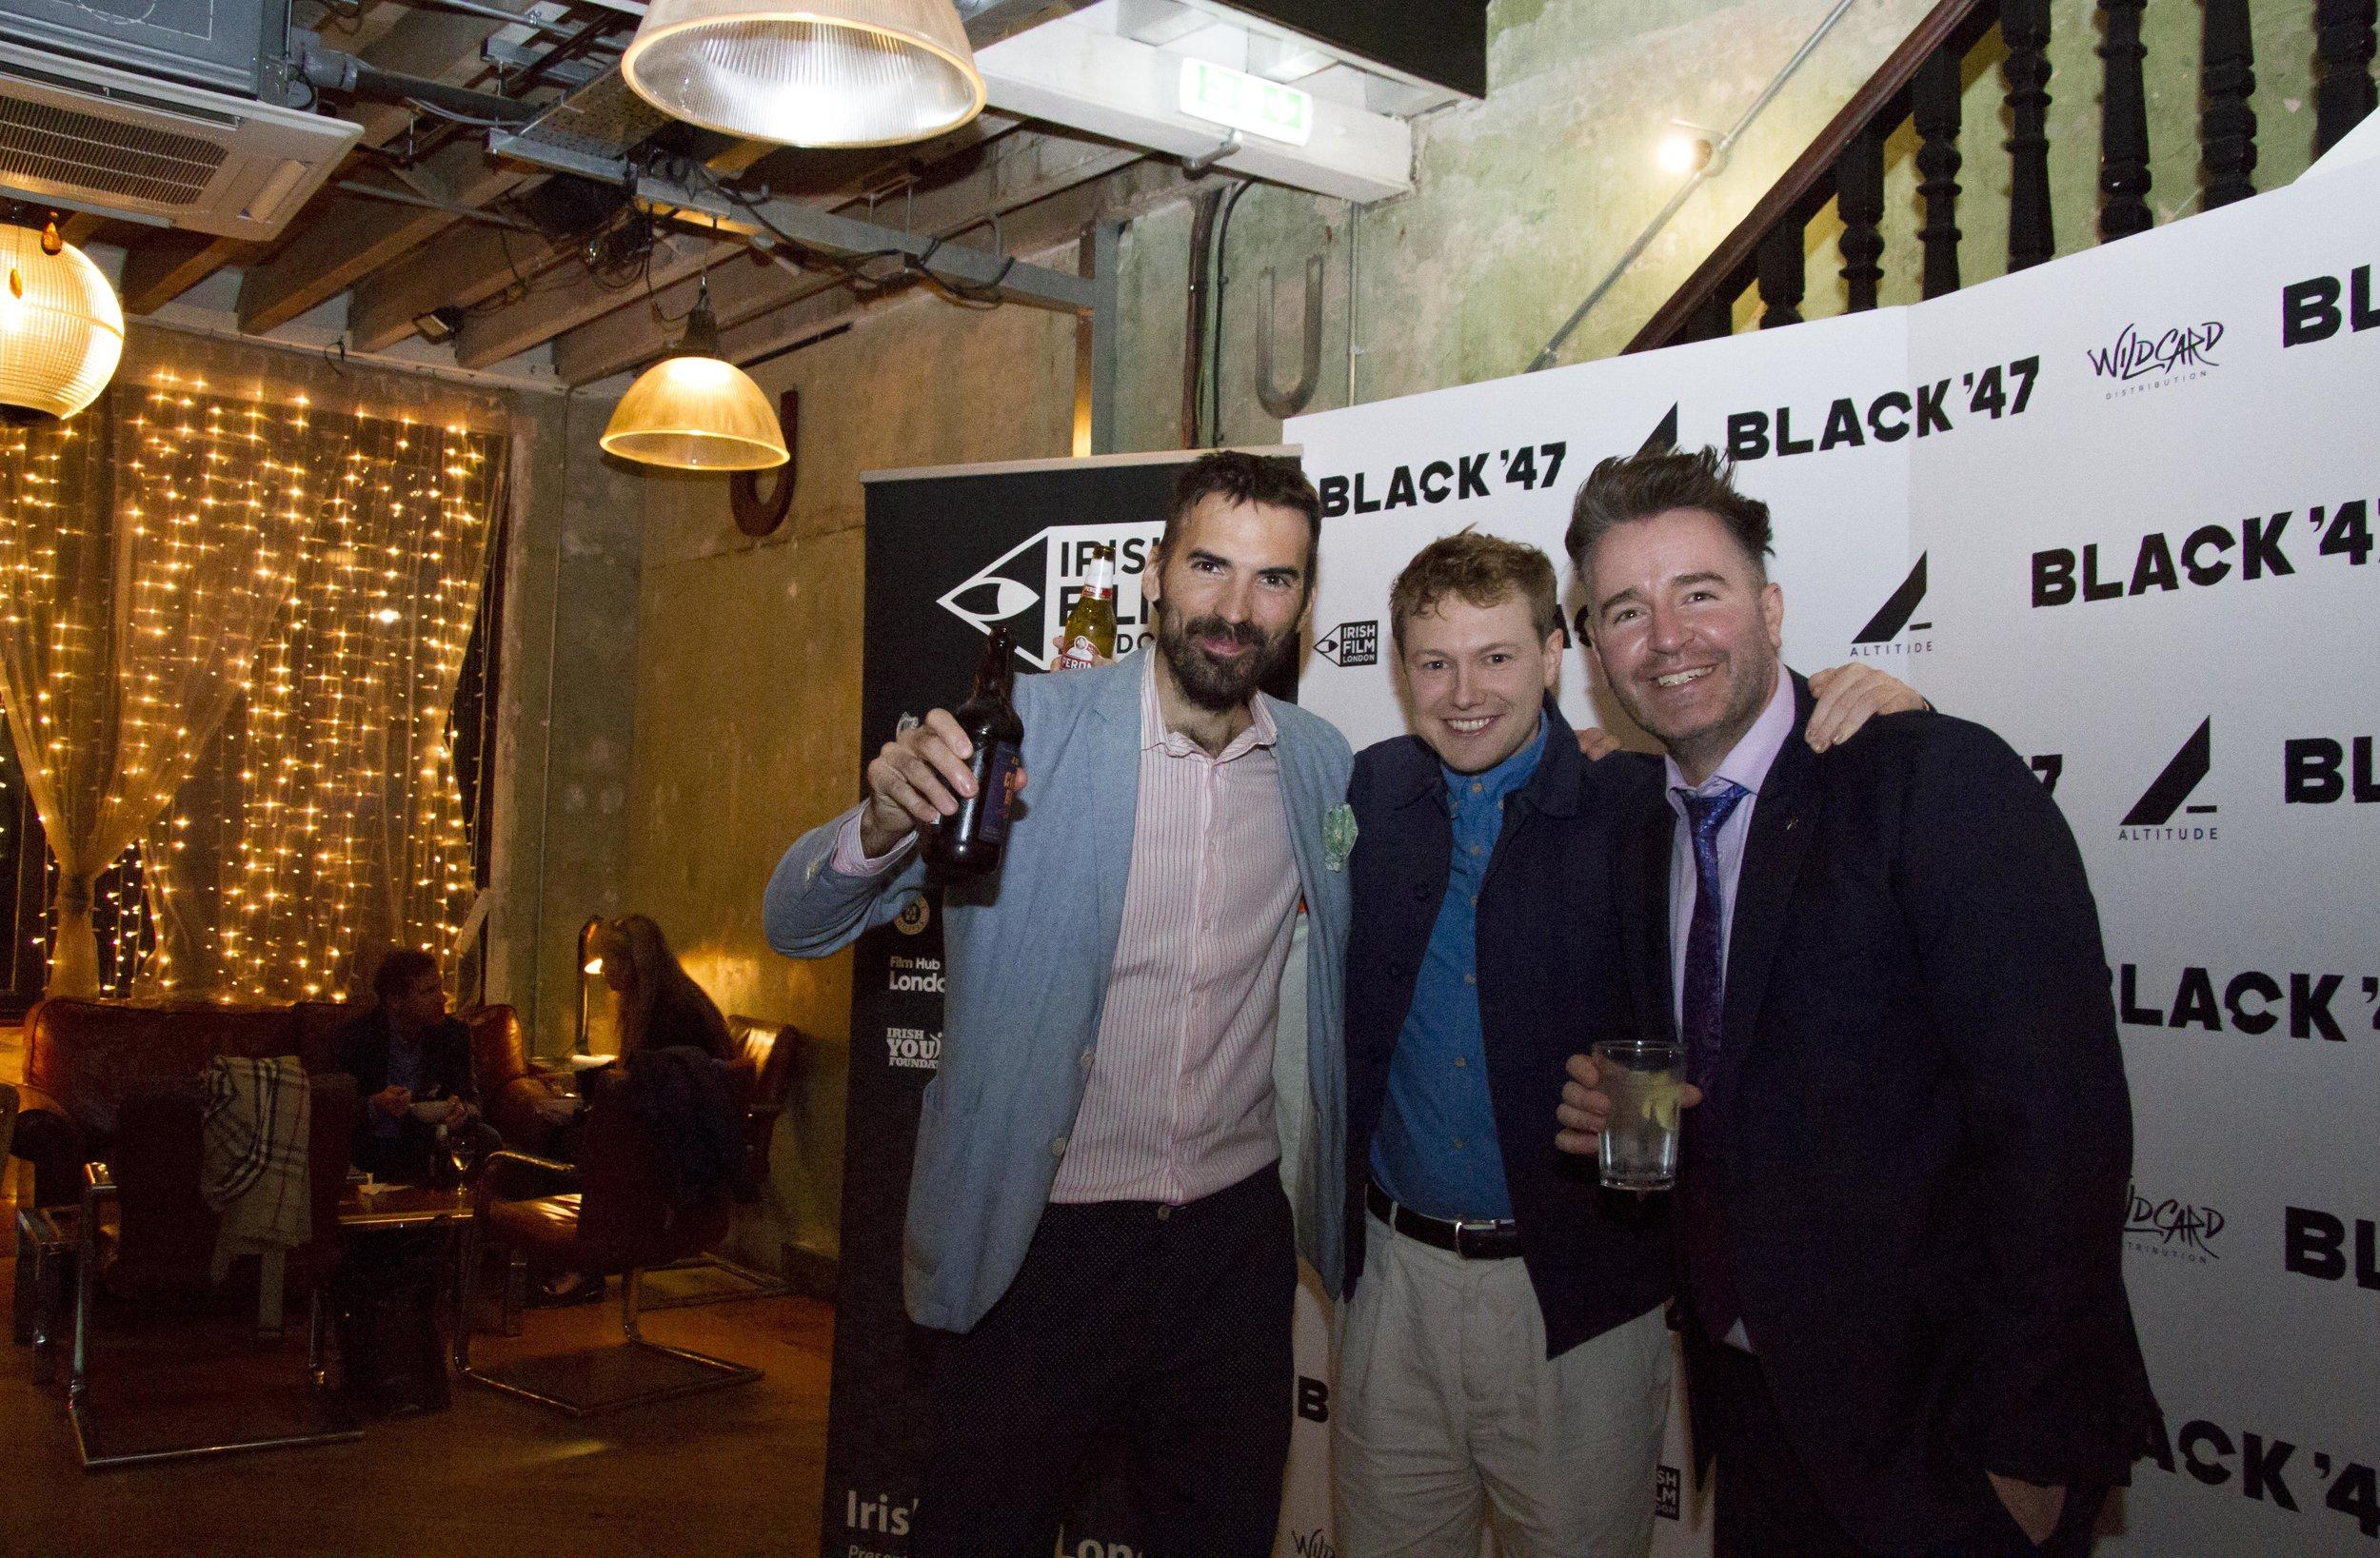 Black 47 London Premiere 2018 Photos courtesy of Noel Mullen Irish Film London 49.jpg